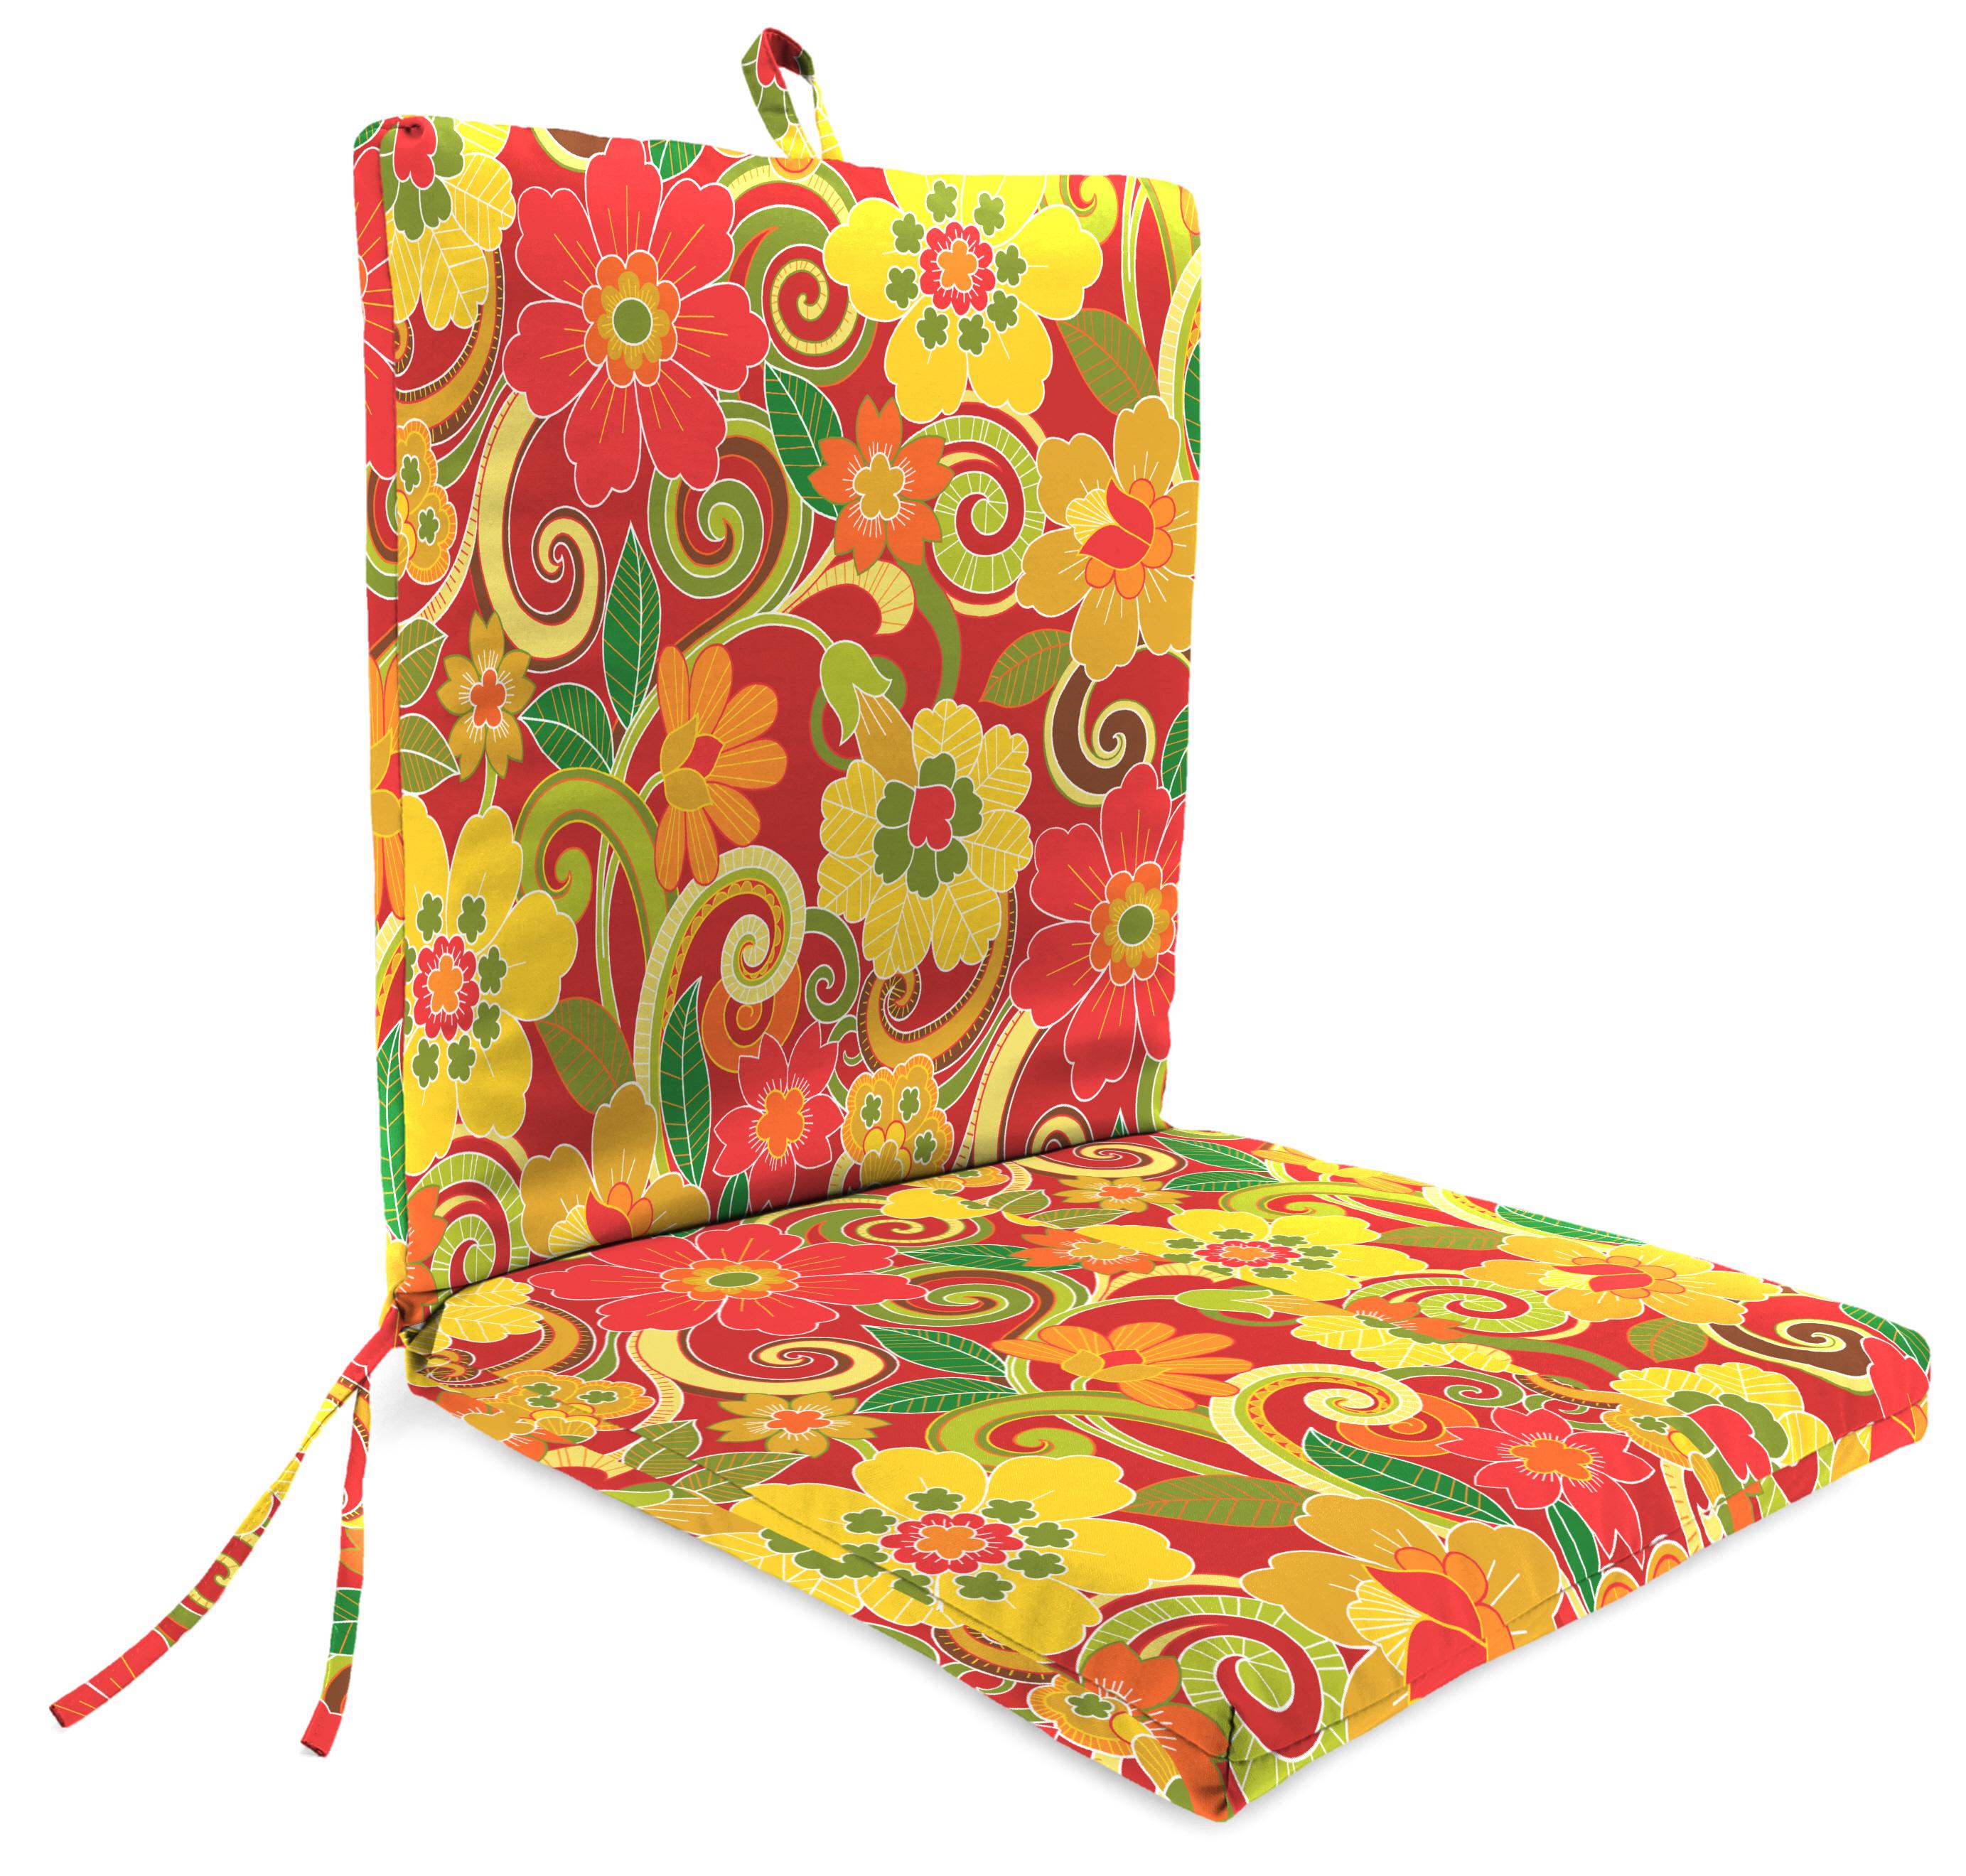 Jordan Manufacturing Co., Inc. Clean Look Patio Chair Cushion in Rollingmead Sangria